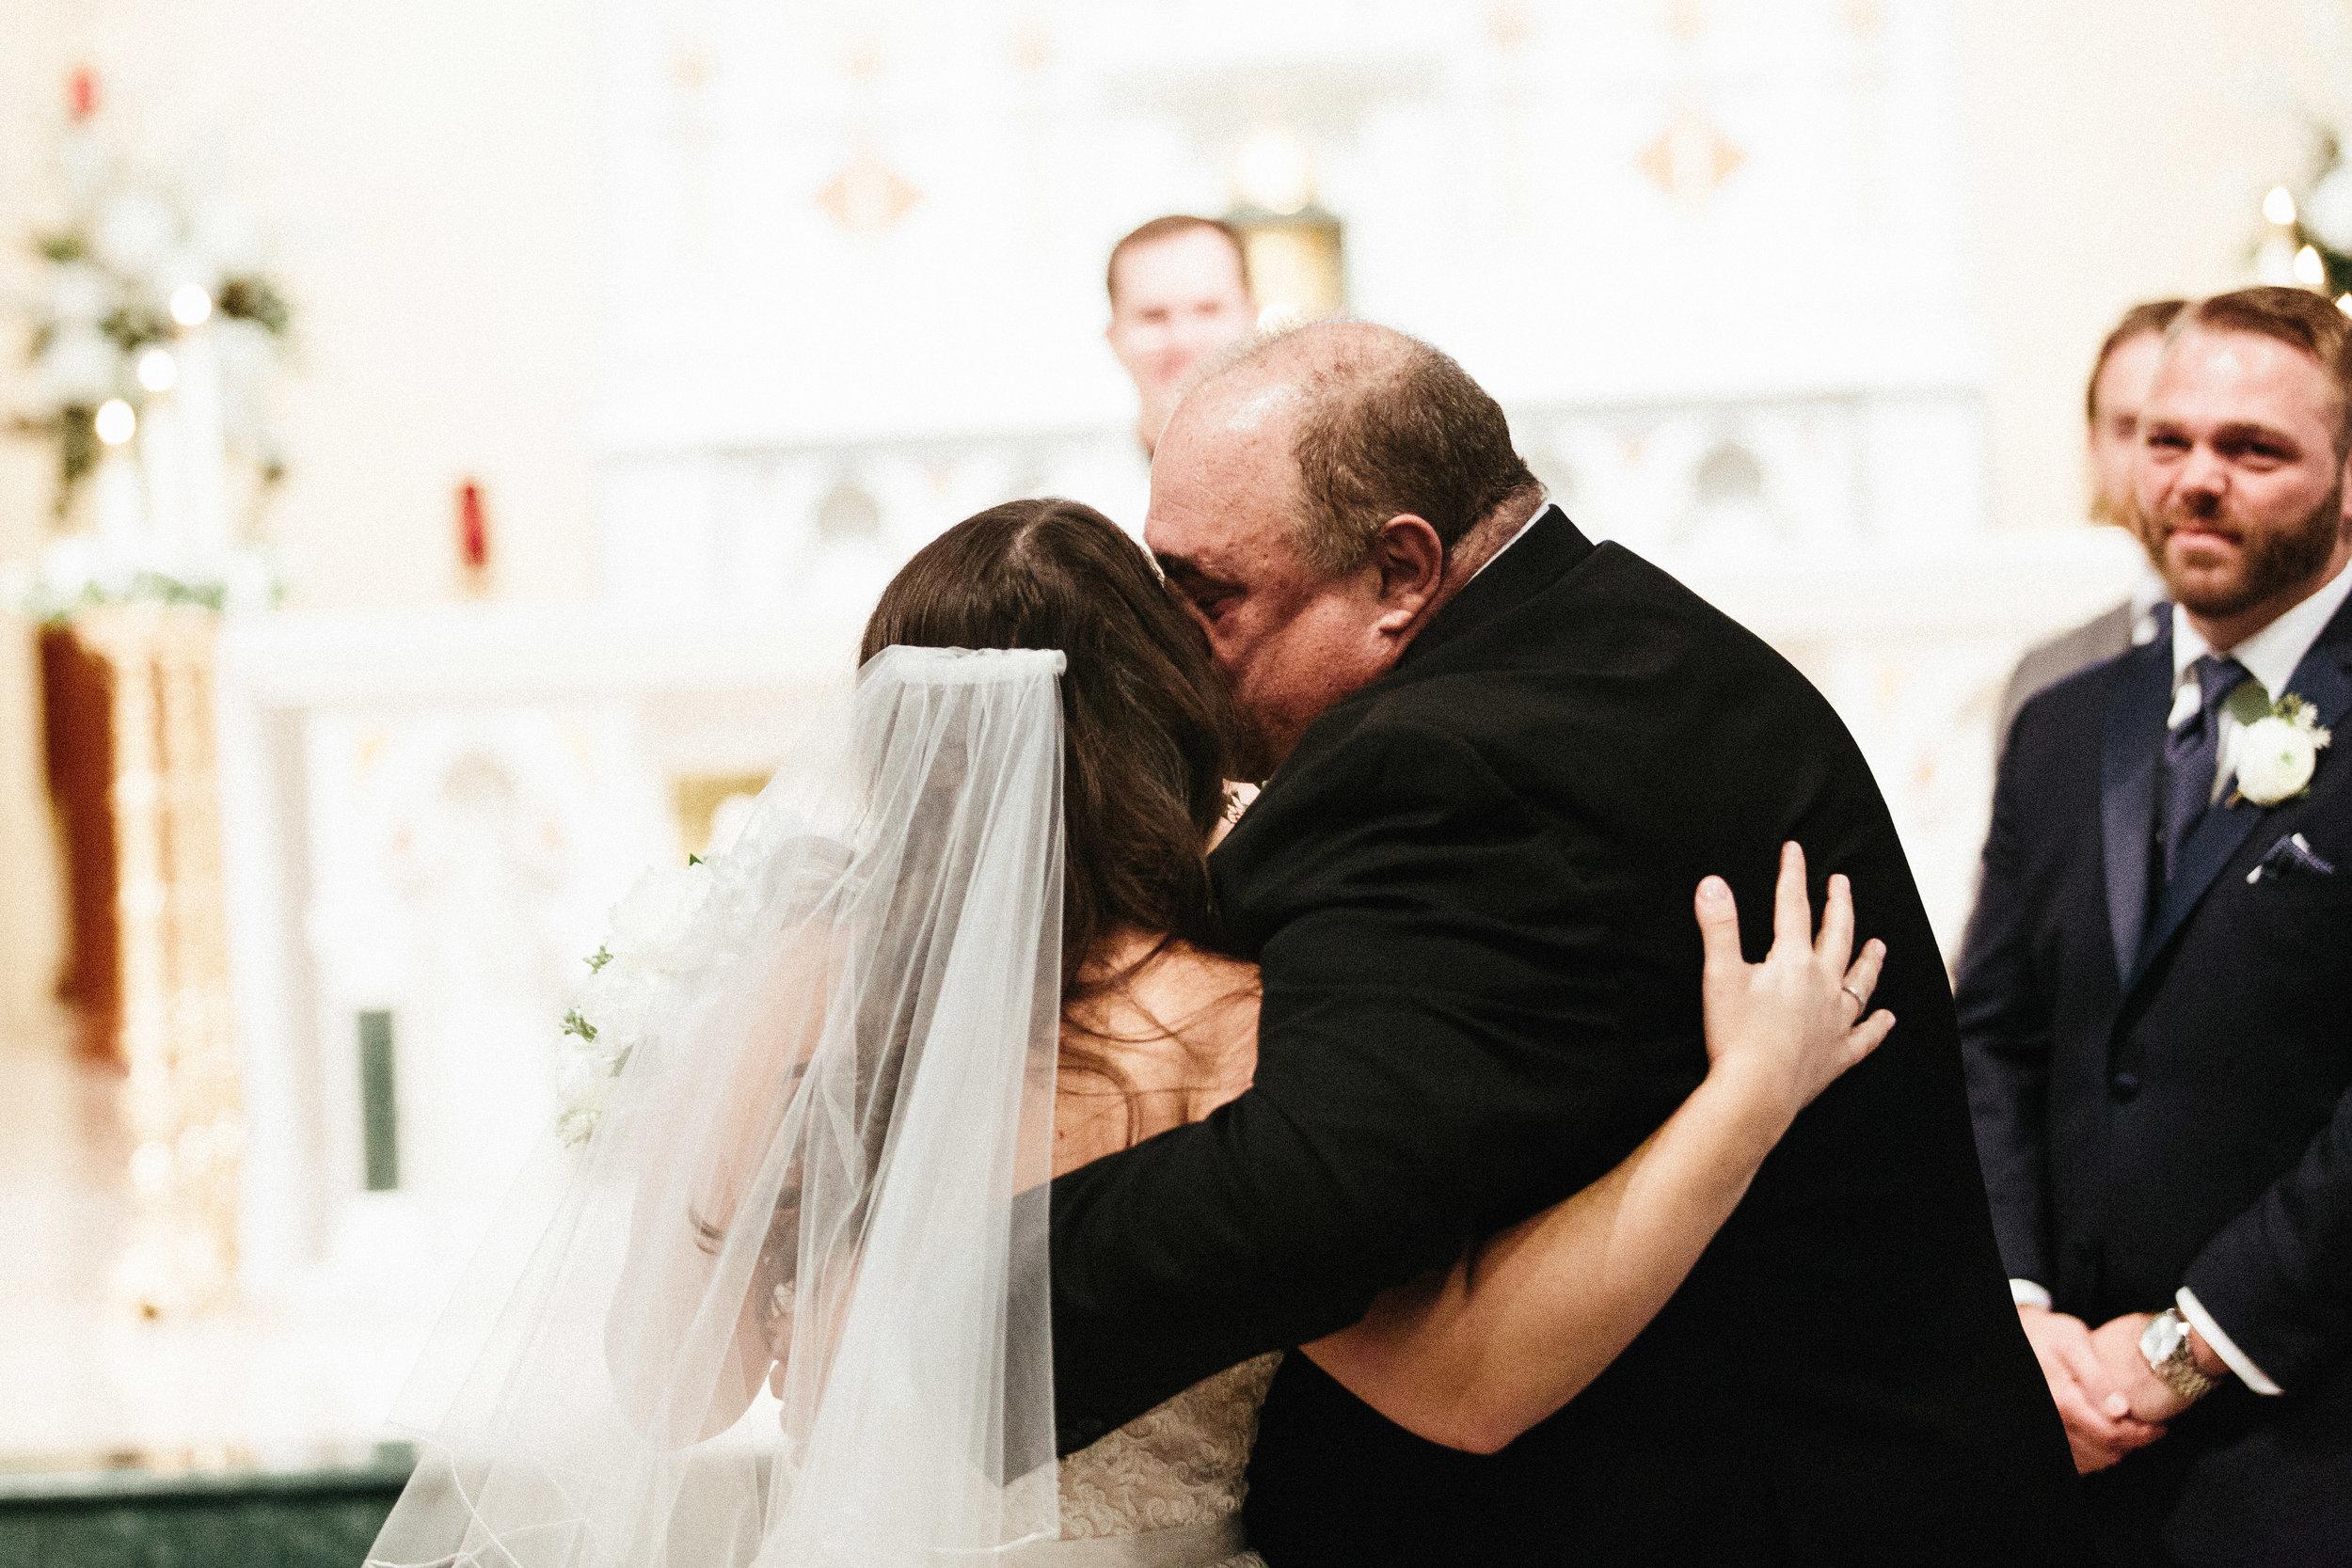 roswell_st_peter_chanel_catholic_avalon_hotel_alpharetta_wedding-1449.jpg